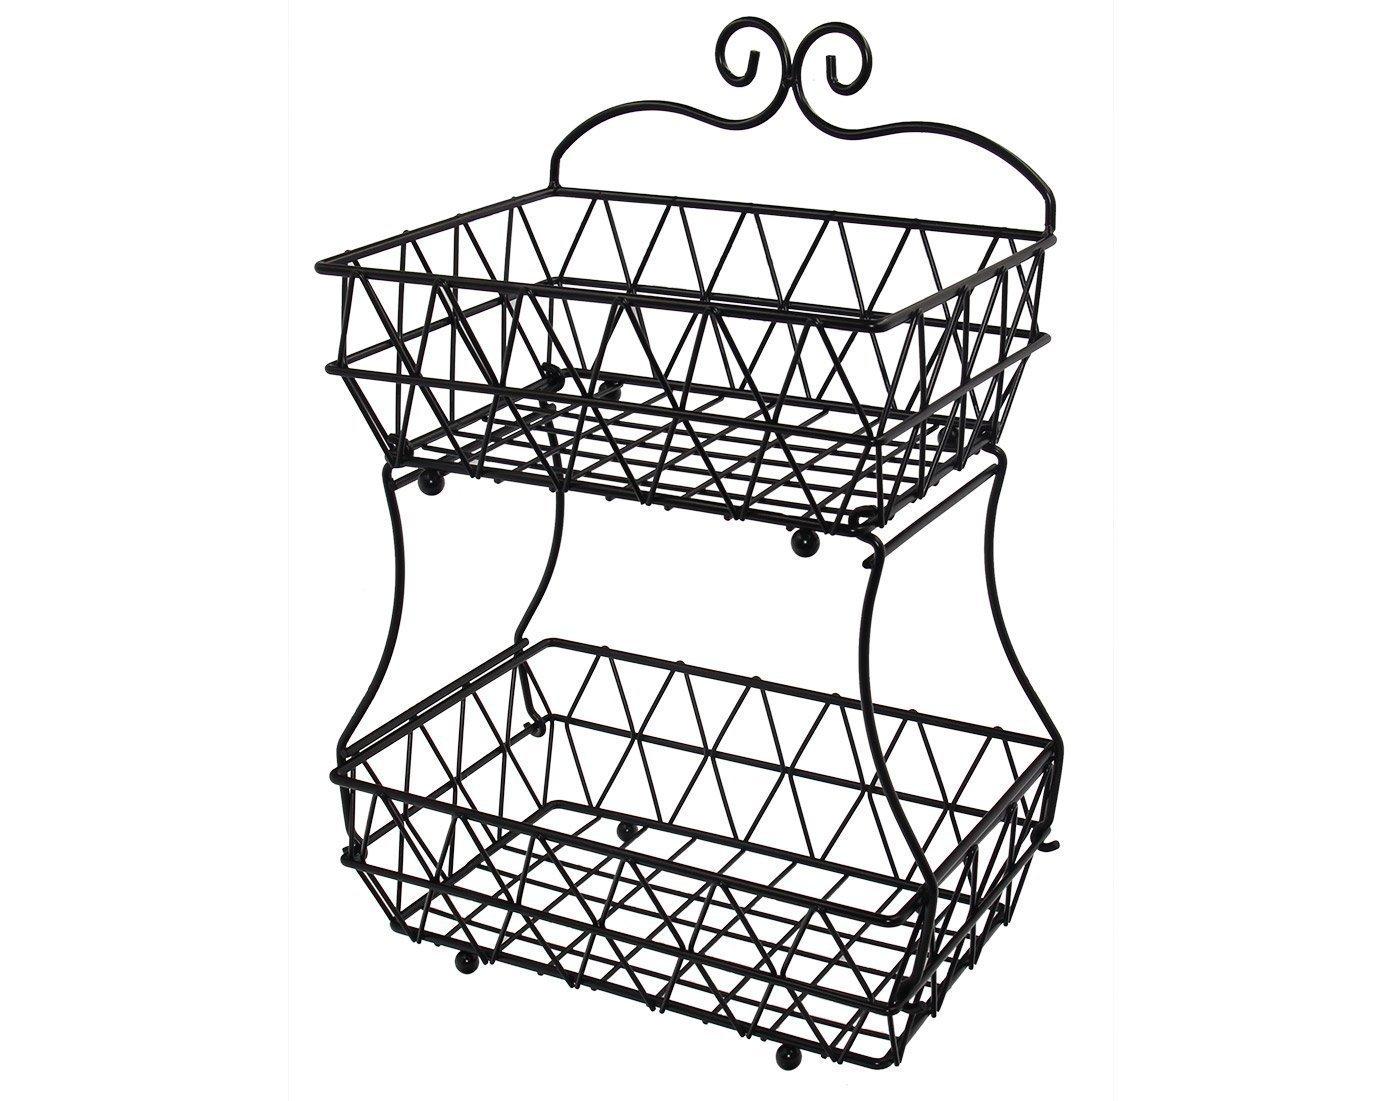 1400x1101 Esylife Upgraded Version Tier Fruit Bread Basket